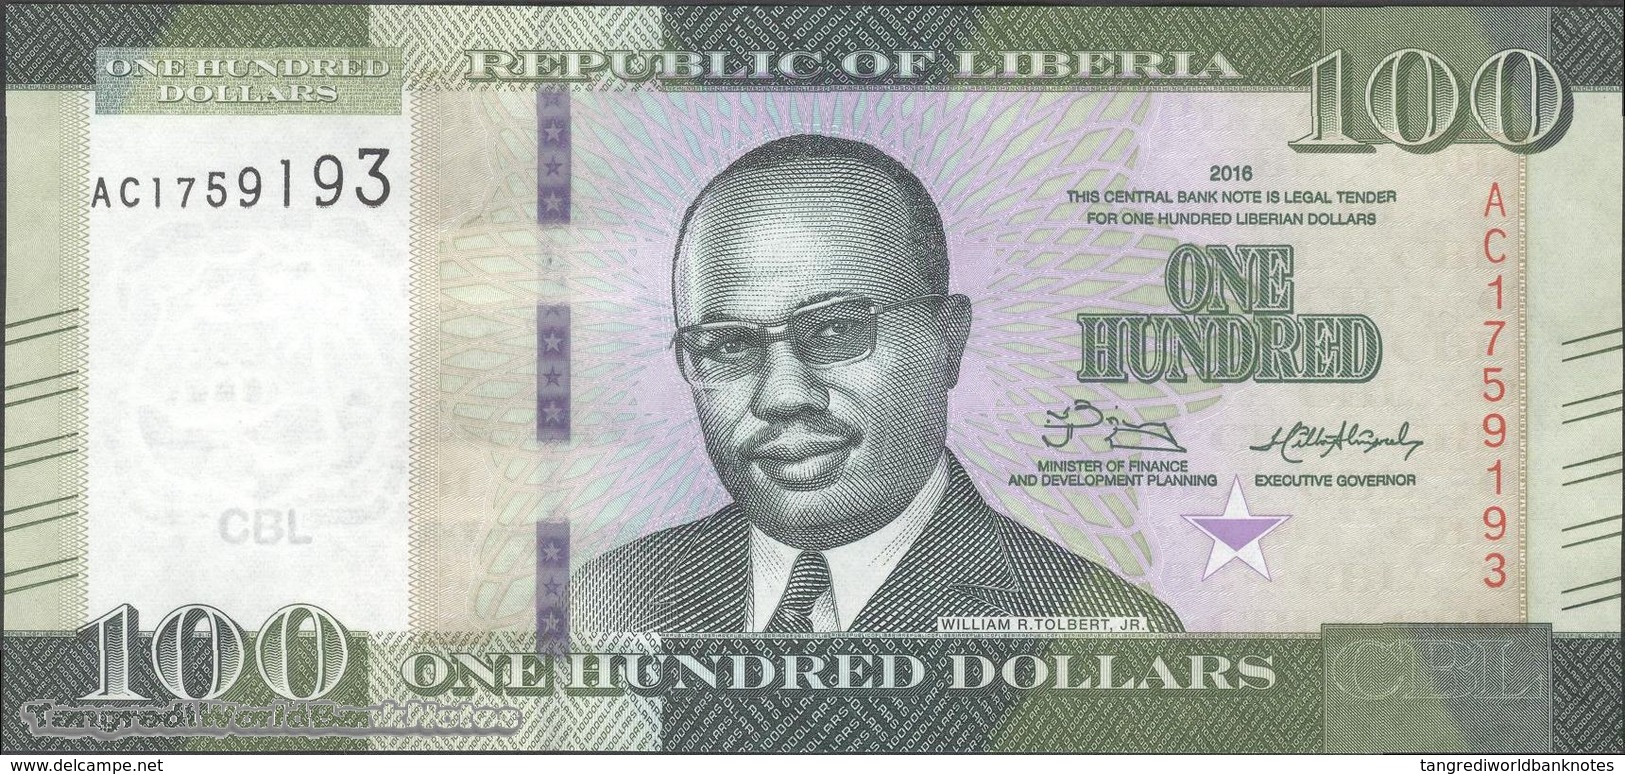 TWN - LIBERIA 35 - 100 Dollars 2016 Prefix AC UNC - Liberia